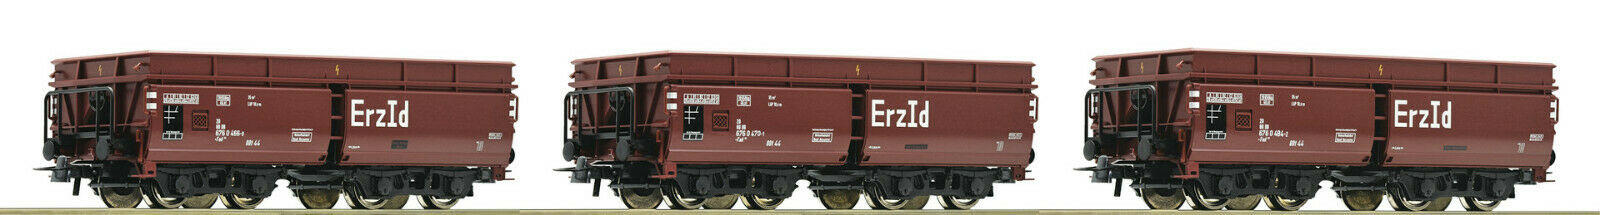 Roco 67148-set  3-piezas erzwagen, DB, época  IV, pista  h0, DC